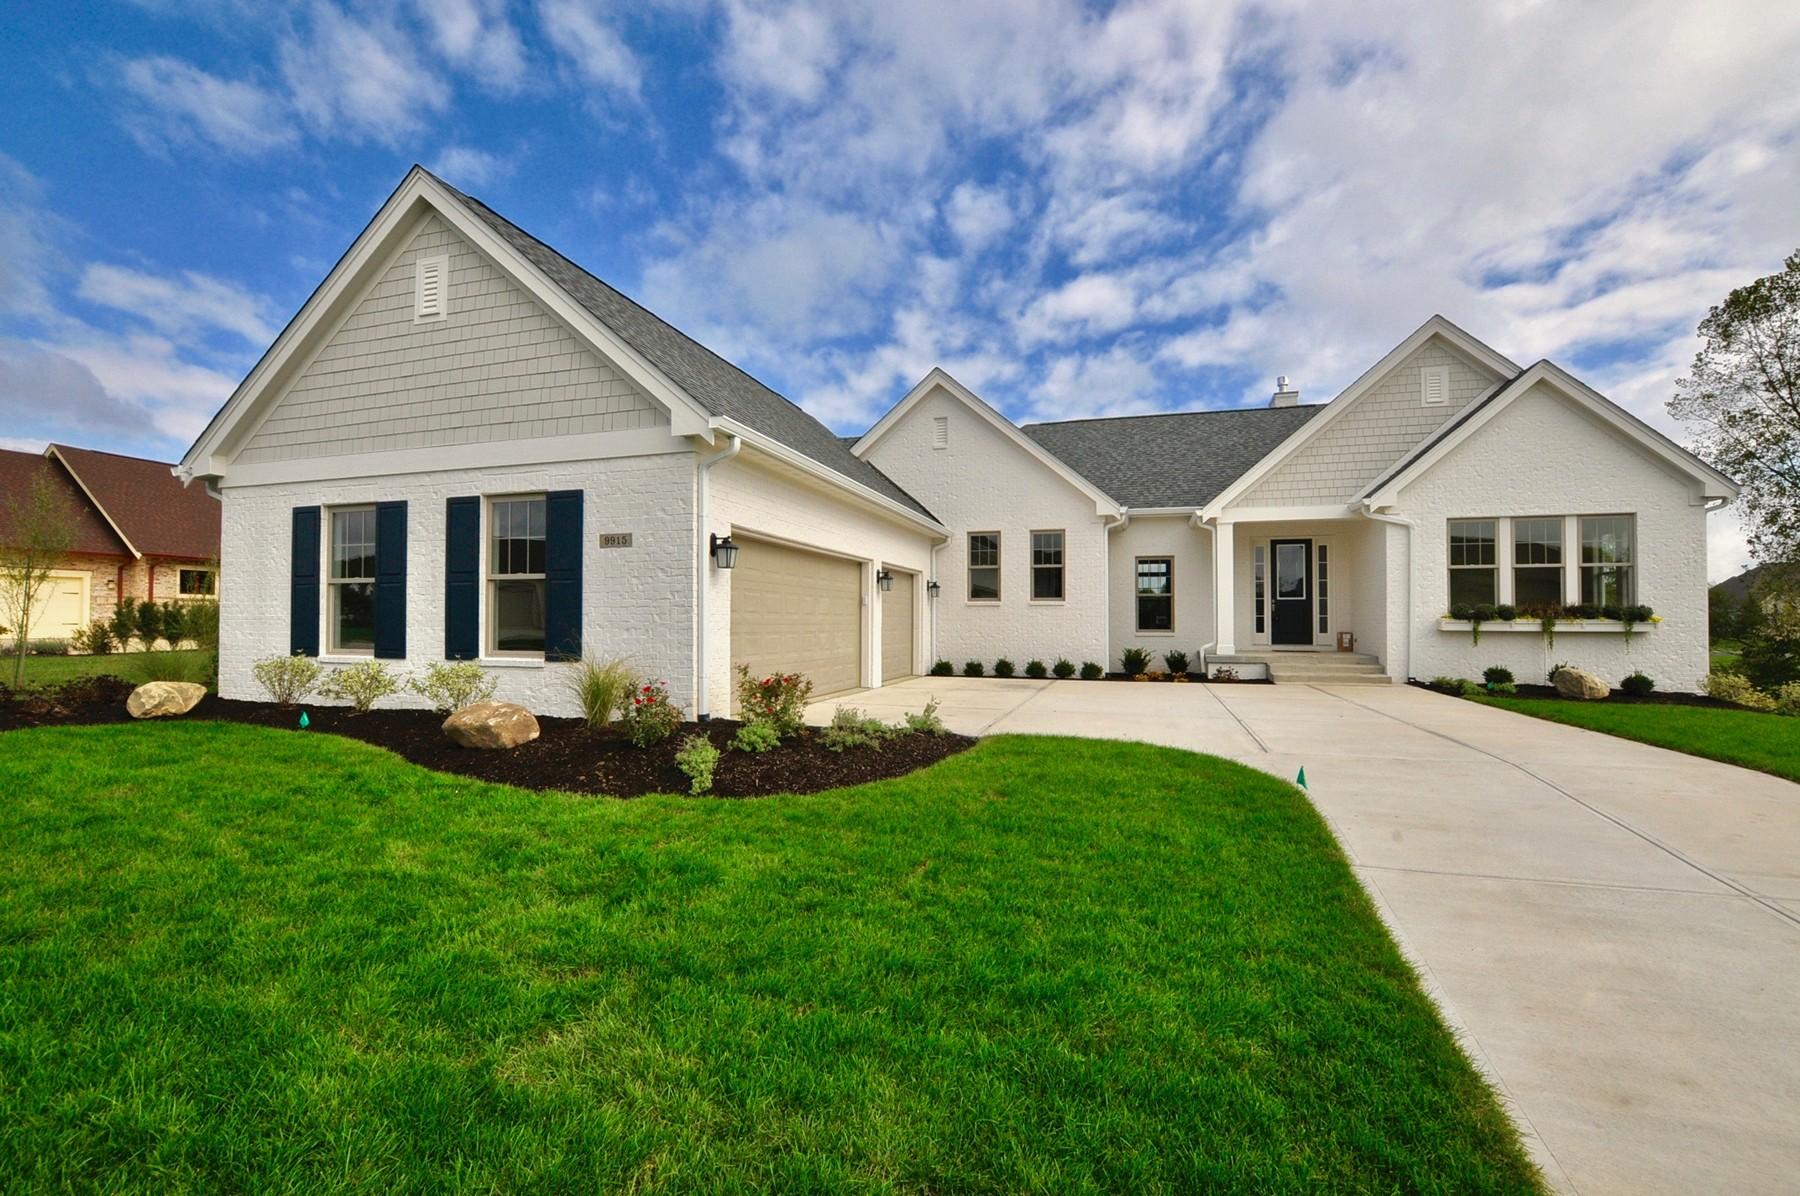 独户住宅 为 销售 在 Top of the Line Finishes 9915 S. Towne Lane 卡梅尔, 印第安纳州 46033 美国